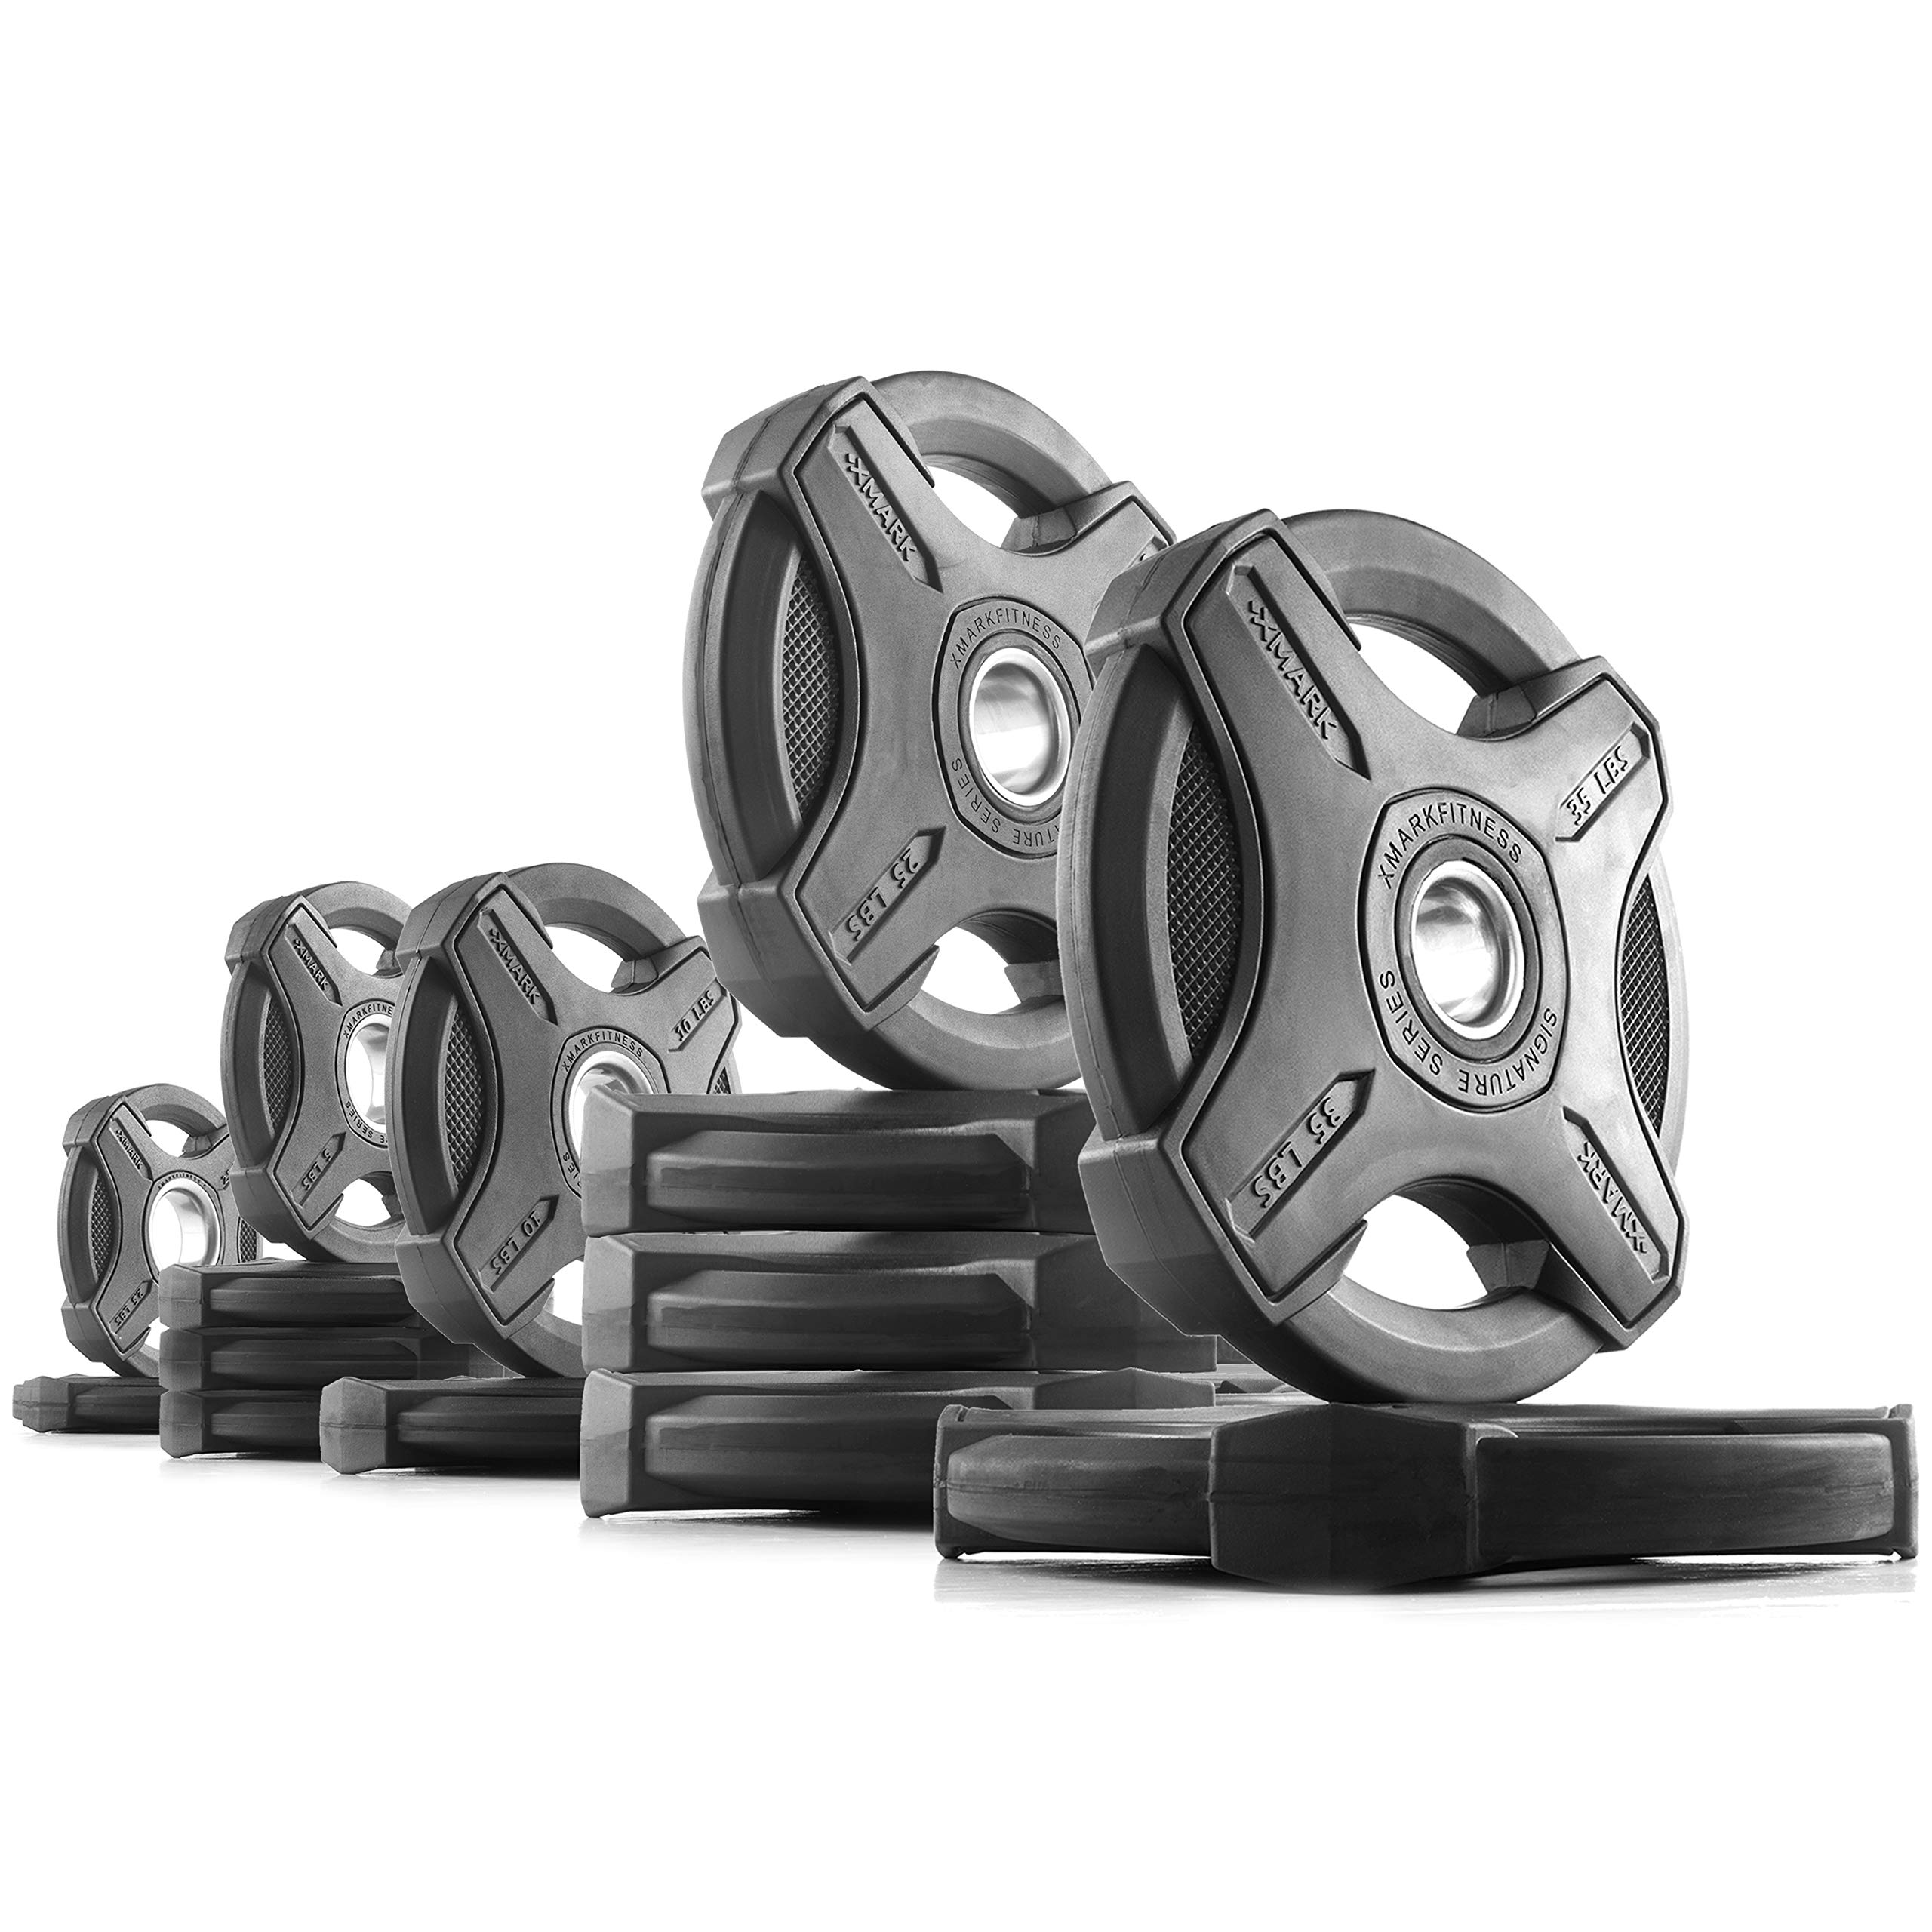 XMark 215 lb Set Signature Plates, One-Year Warranty, Olympic Weight Plates, Cutting-Edge Design